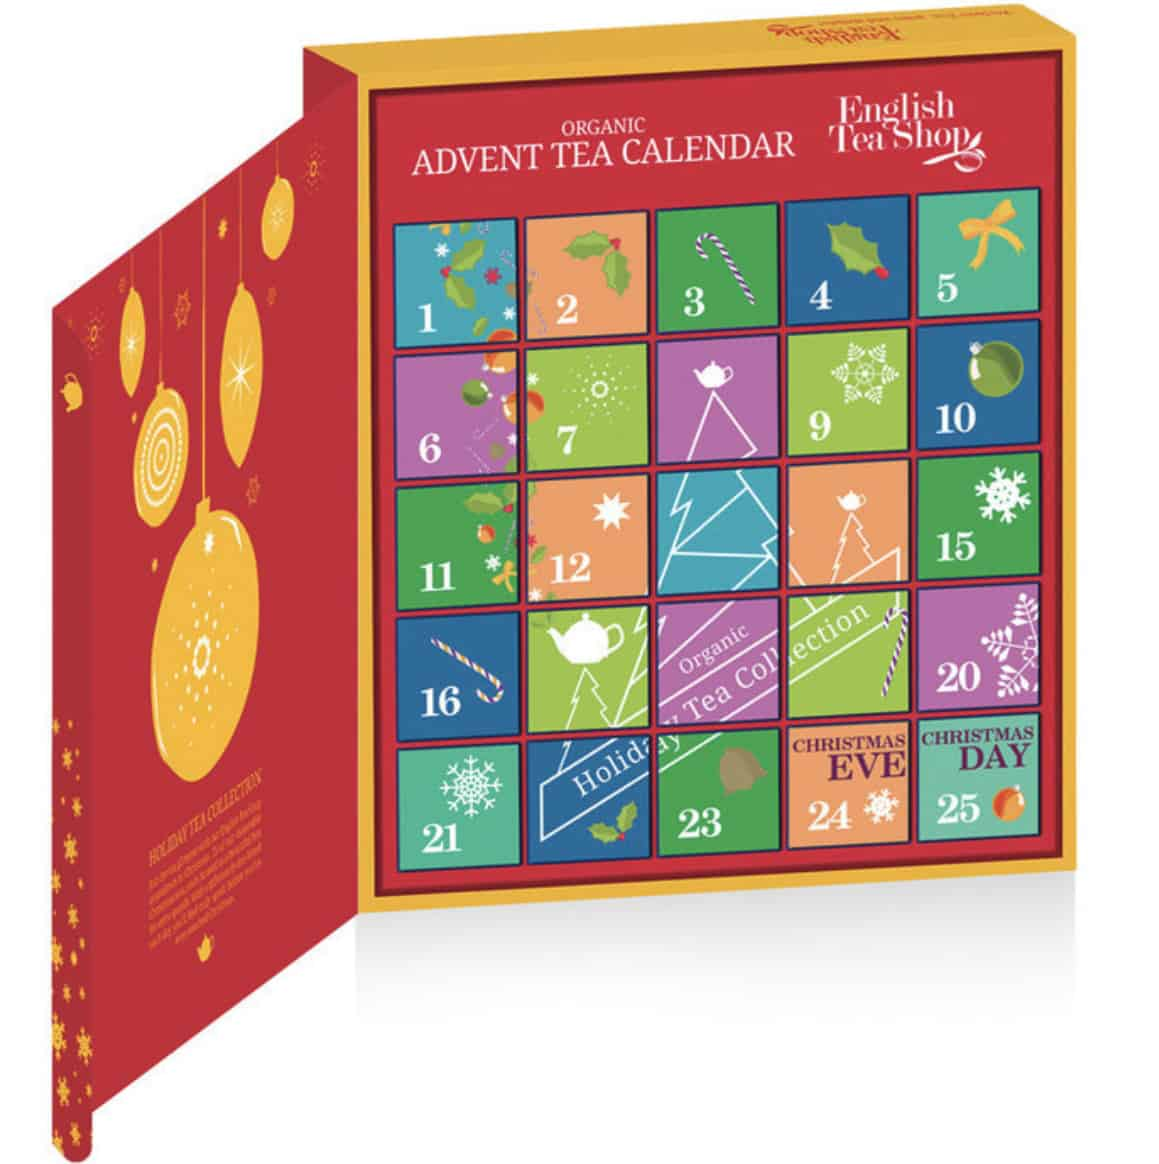 English Tea Shop Advent Calendar Red Australia Nz Afterpay Avail